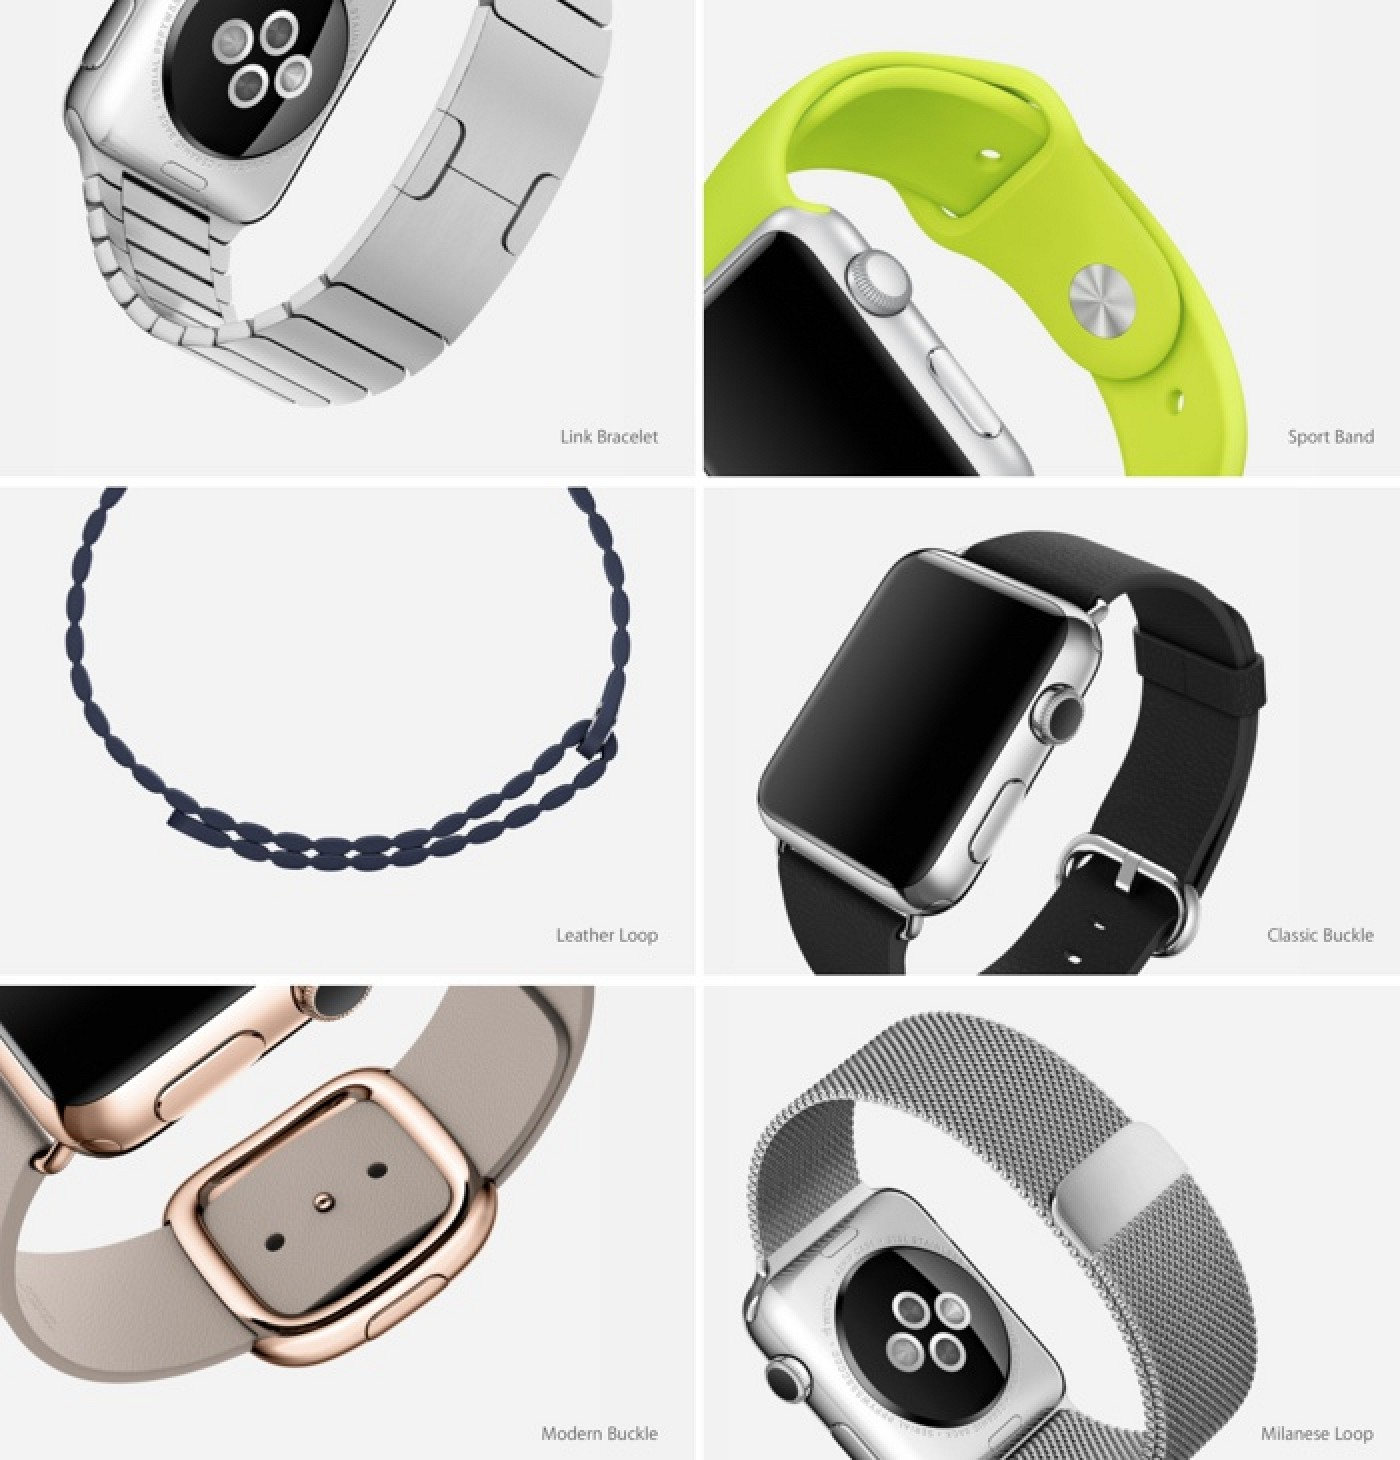 applewatchbands.jpg?retina